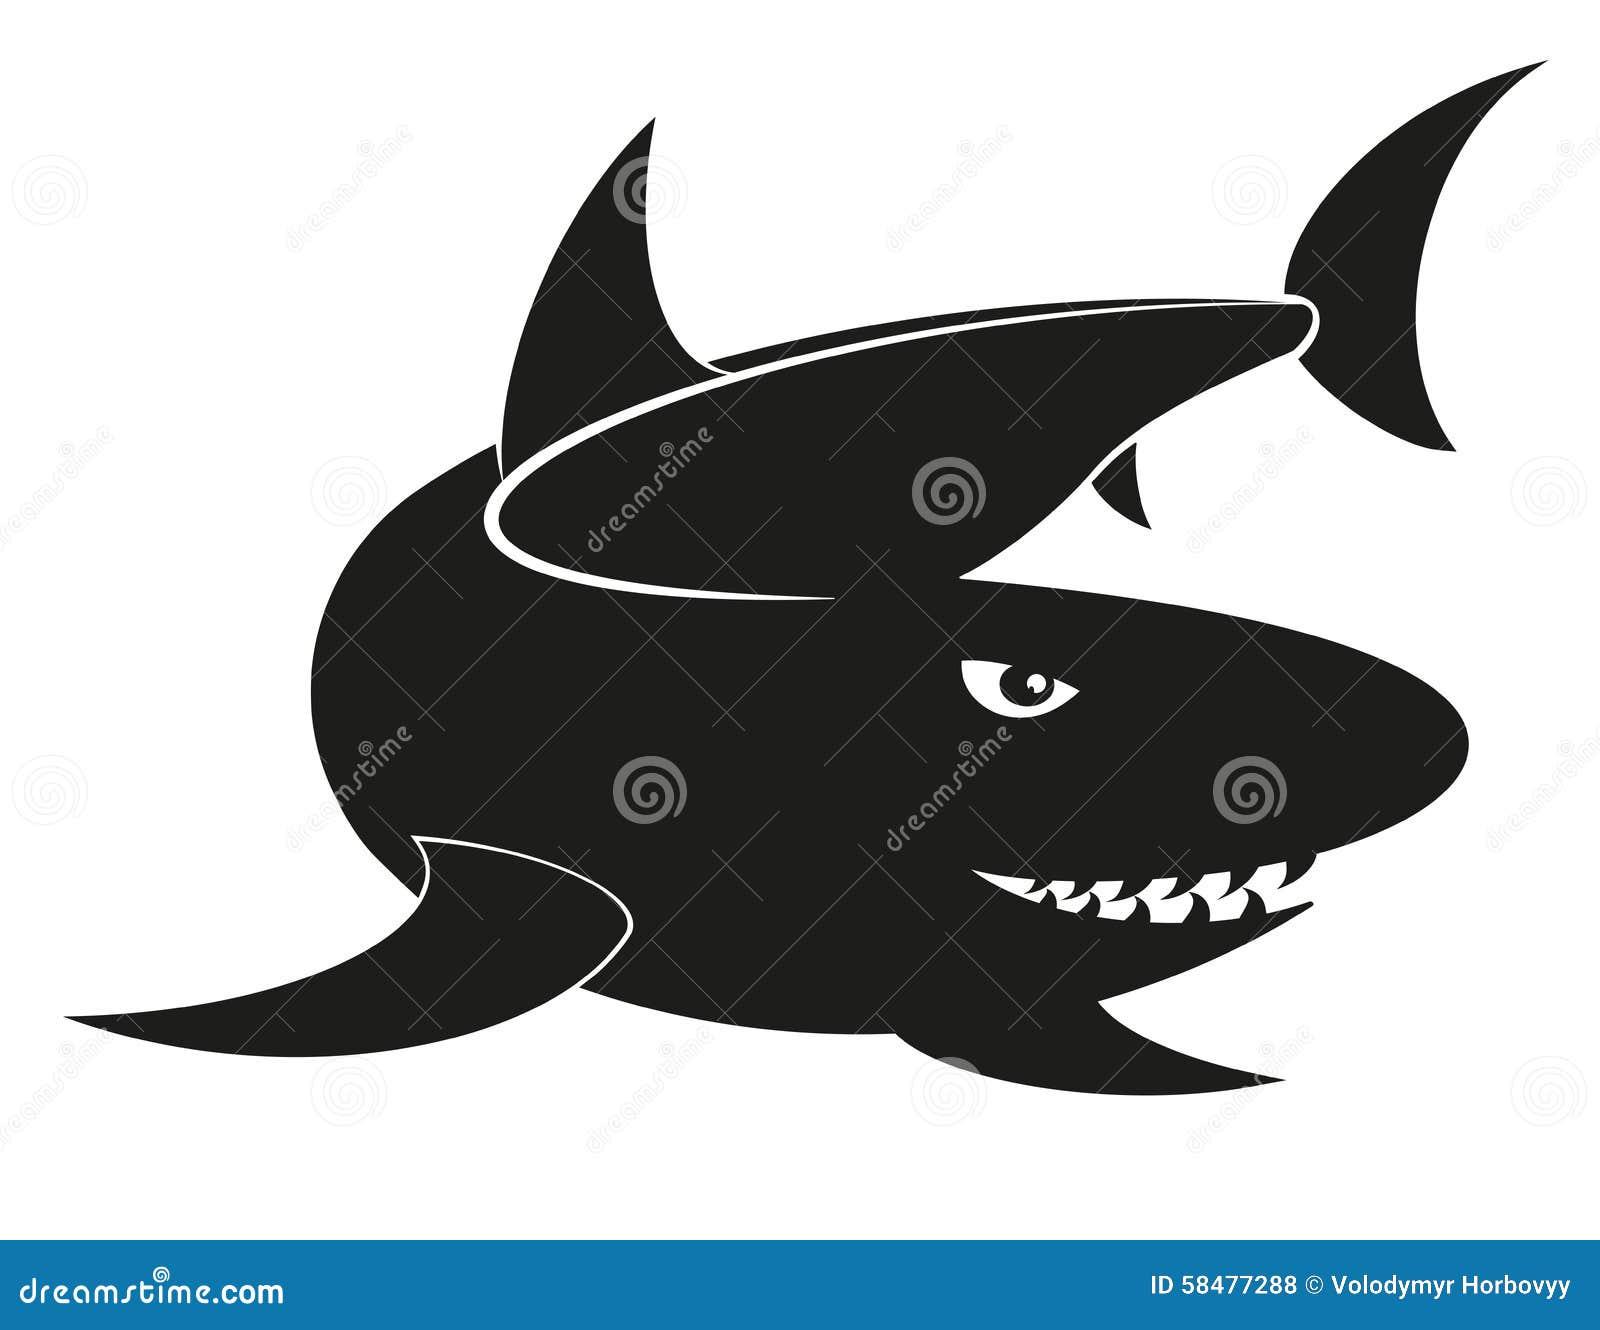 Vector Shark Stock Vector - Image: 58477288